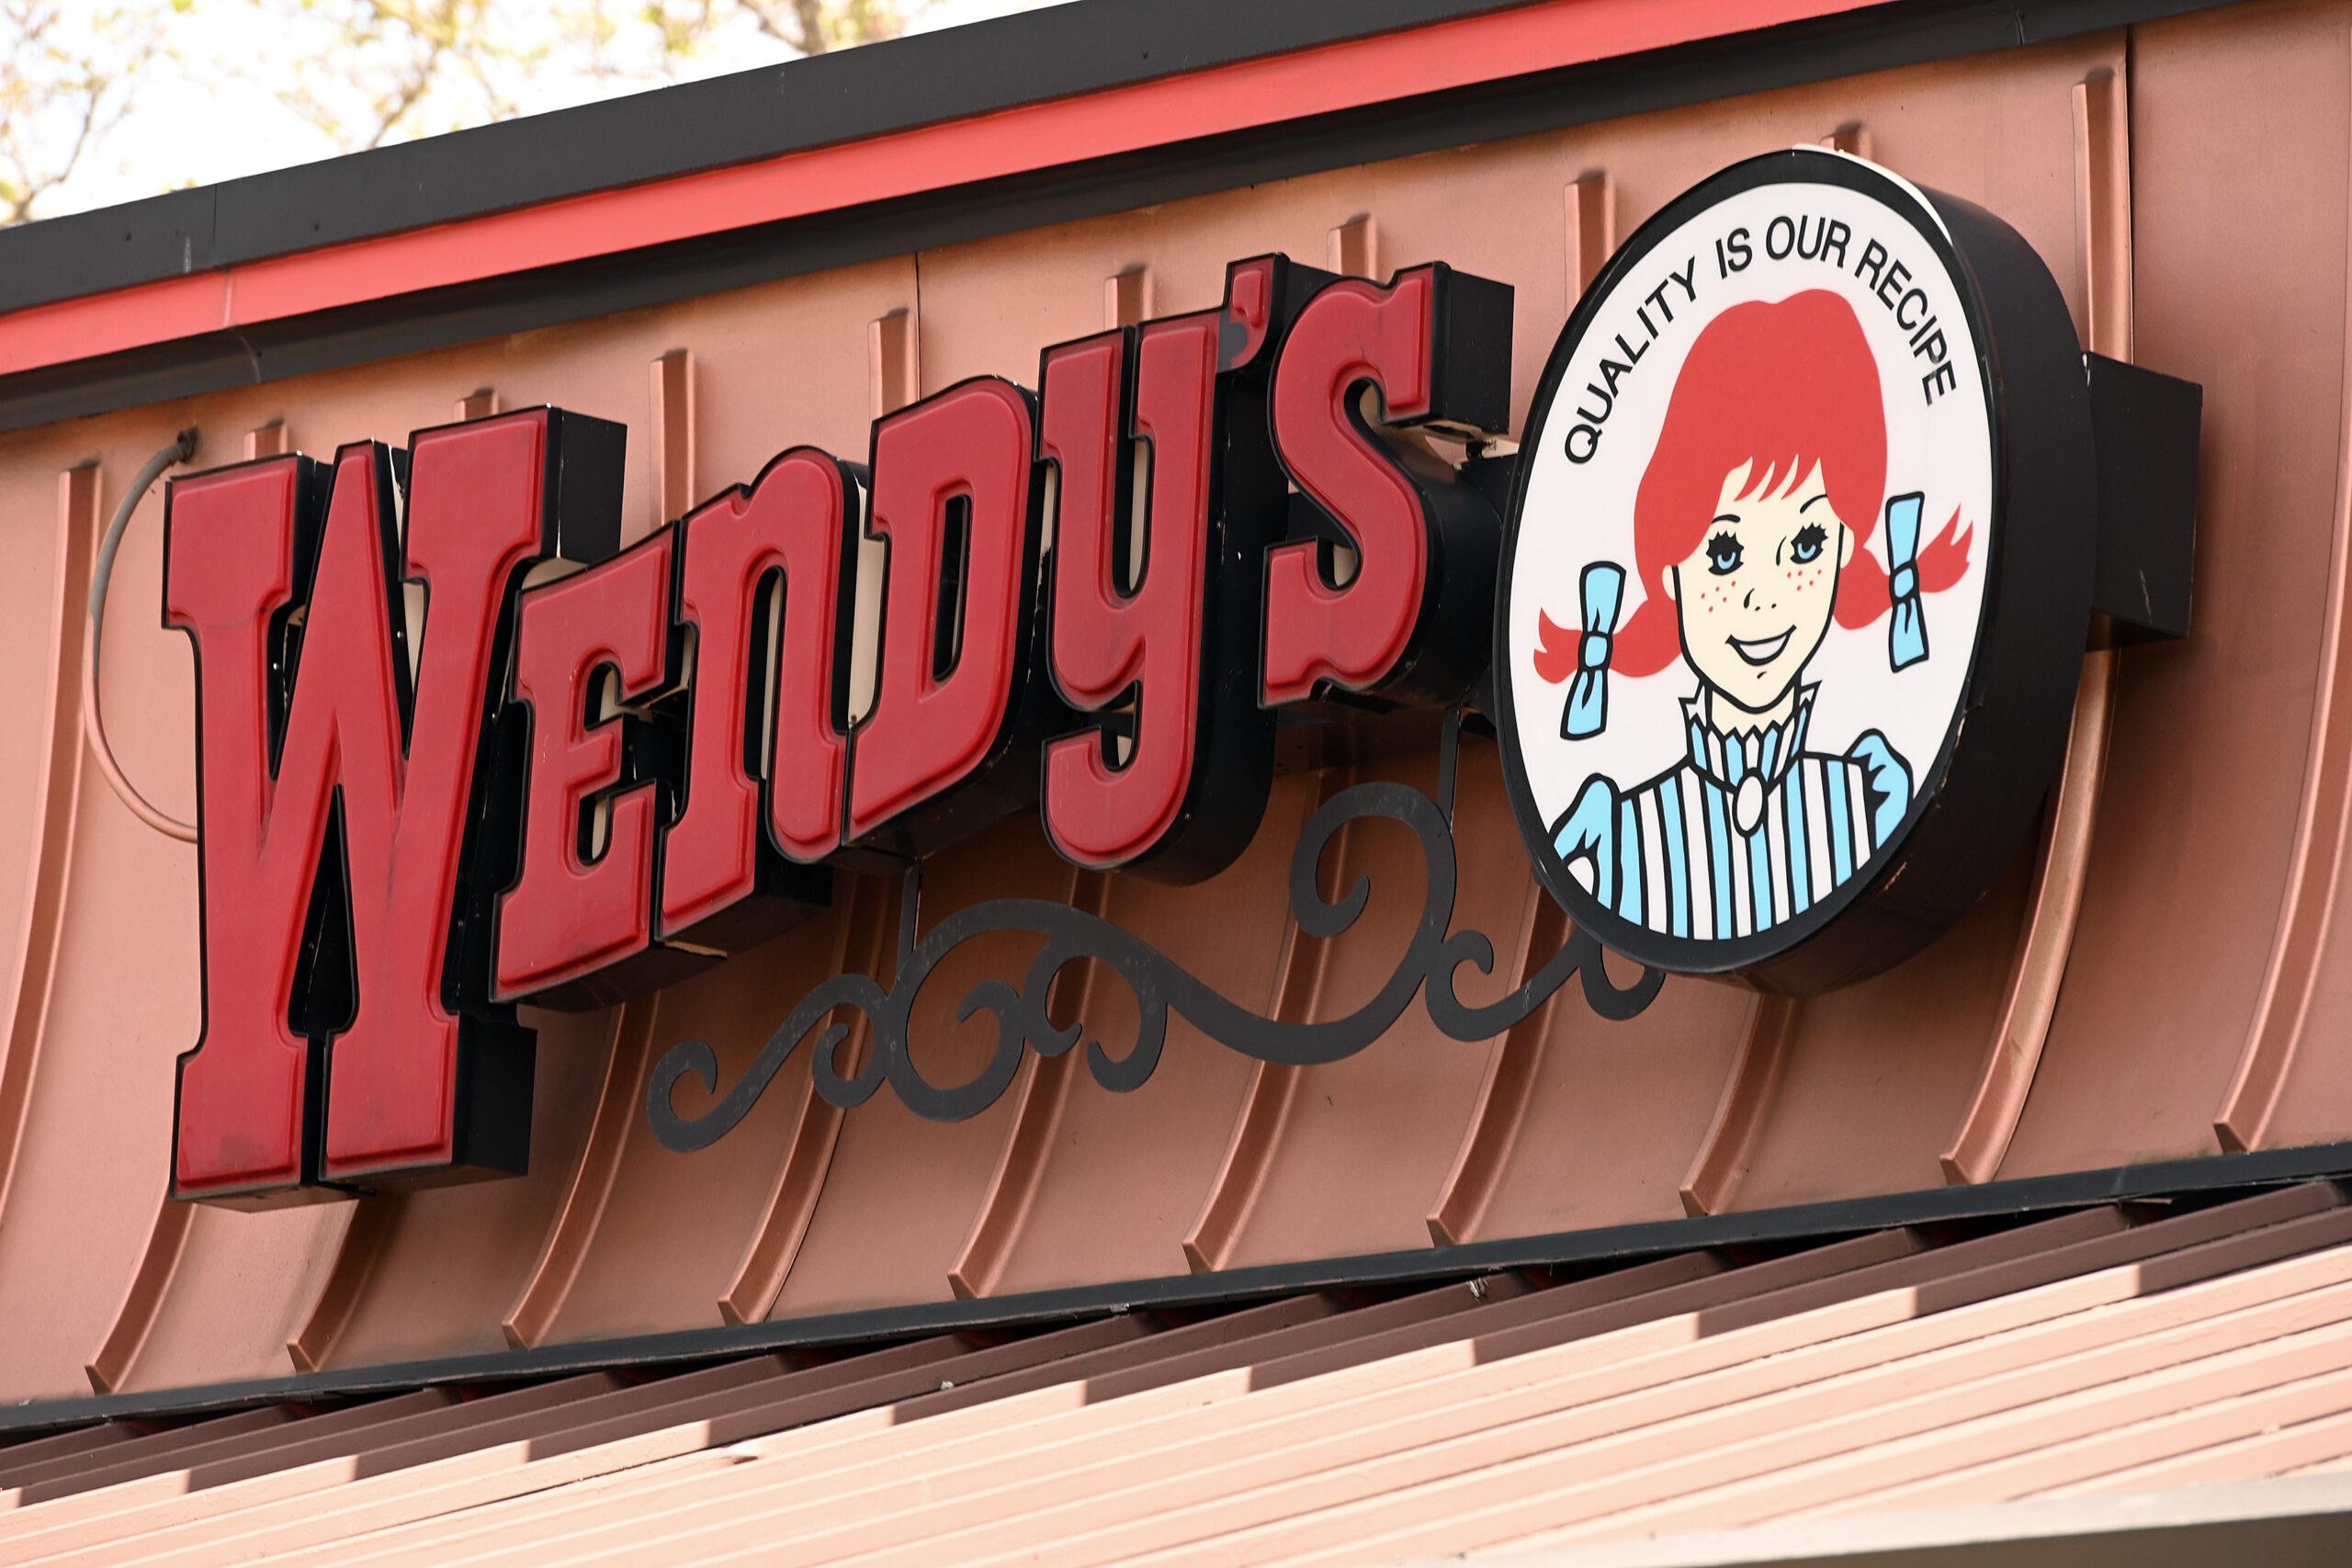 Wendy's UK